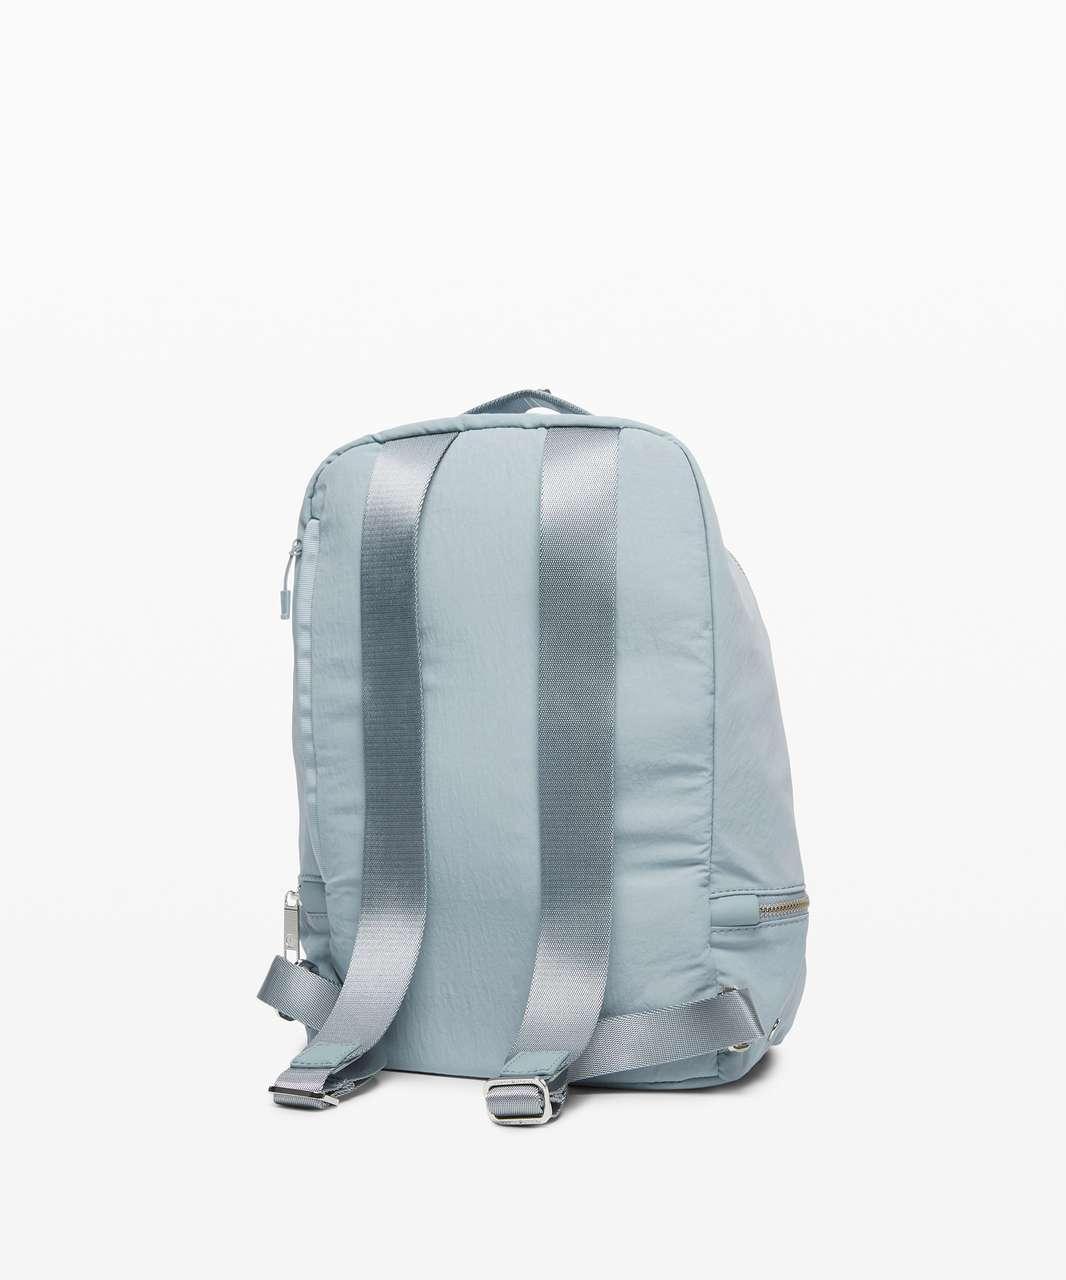 Lululemon City Adventurer Backpack Mini *10L - Blue Cast